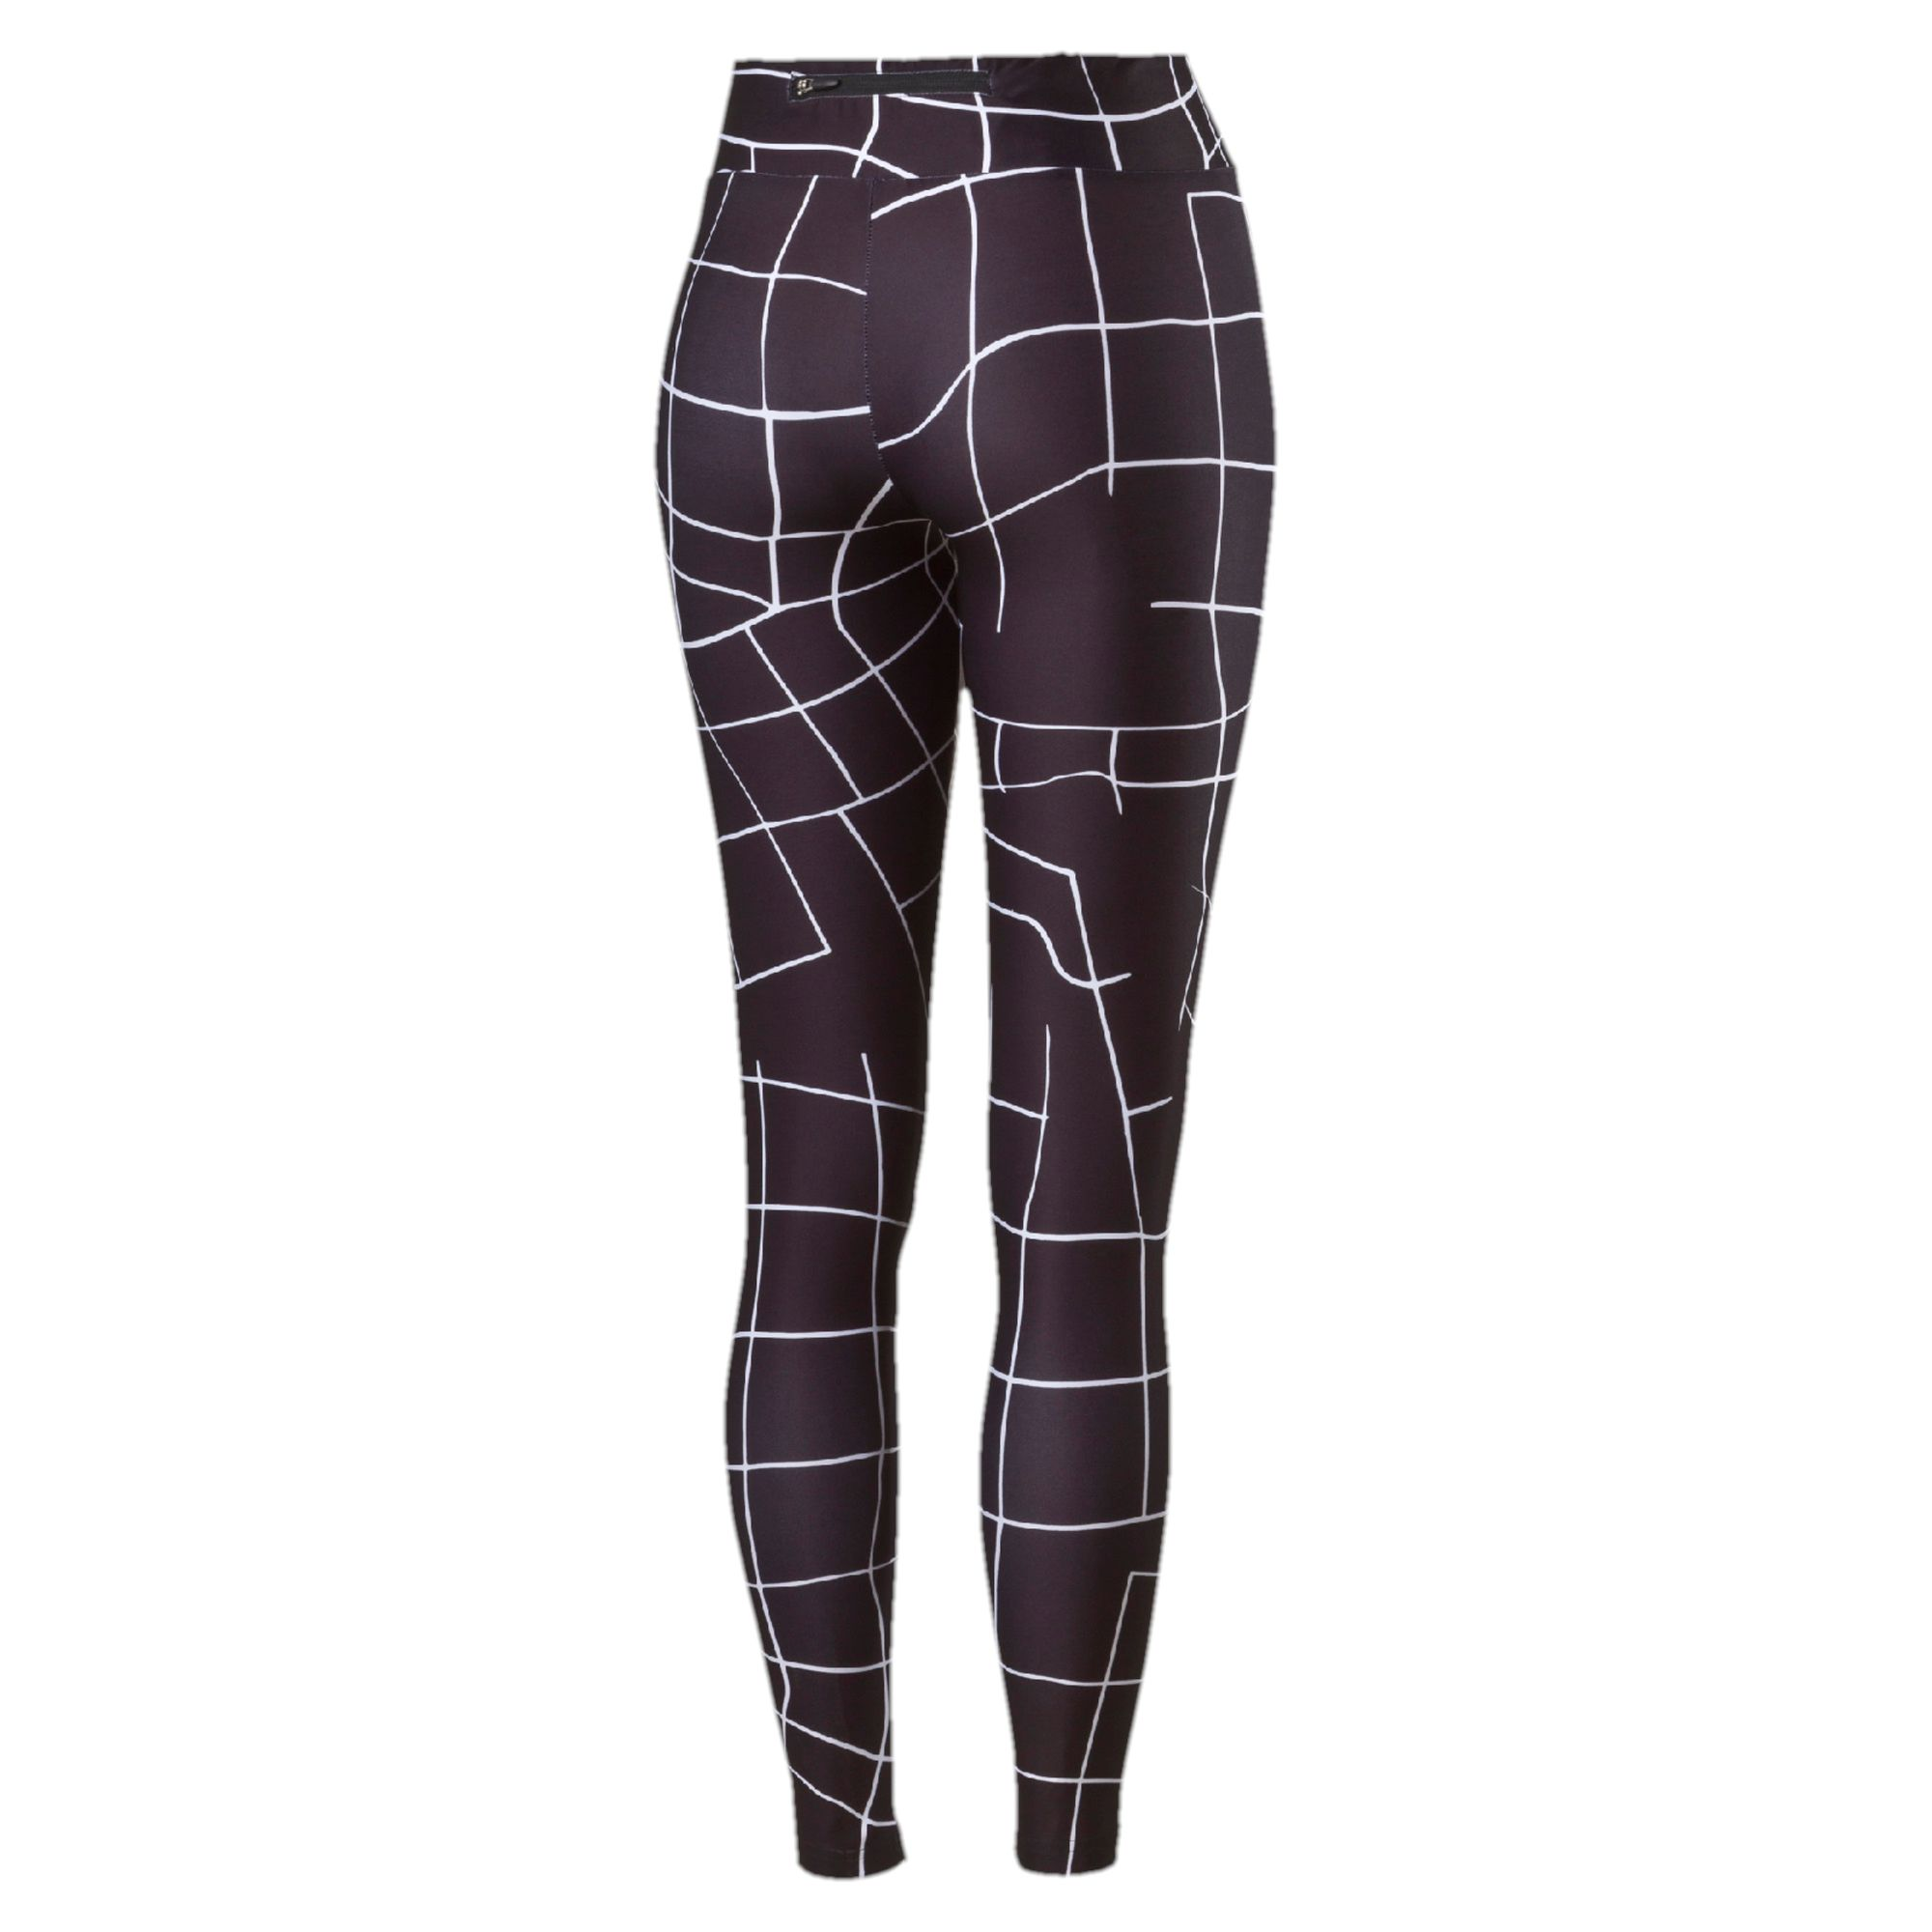 puma evolution grid damen leggings sporthose frauen neu ebay. Black Bedroom Furniture Sets. Home Design Ideas